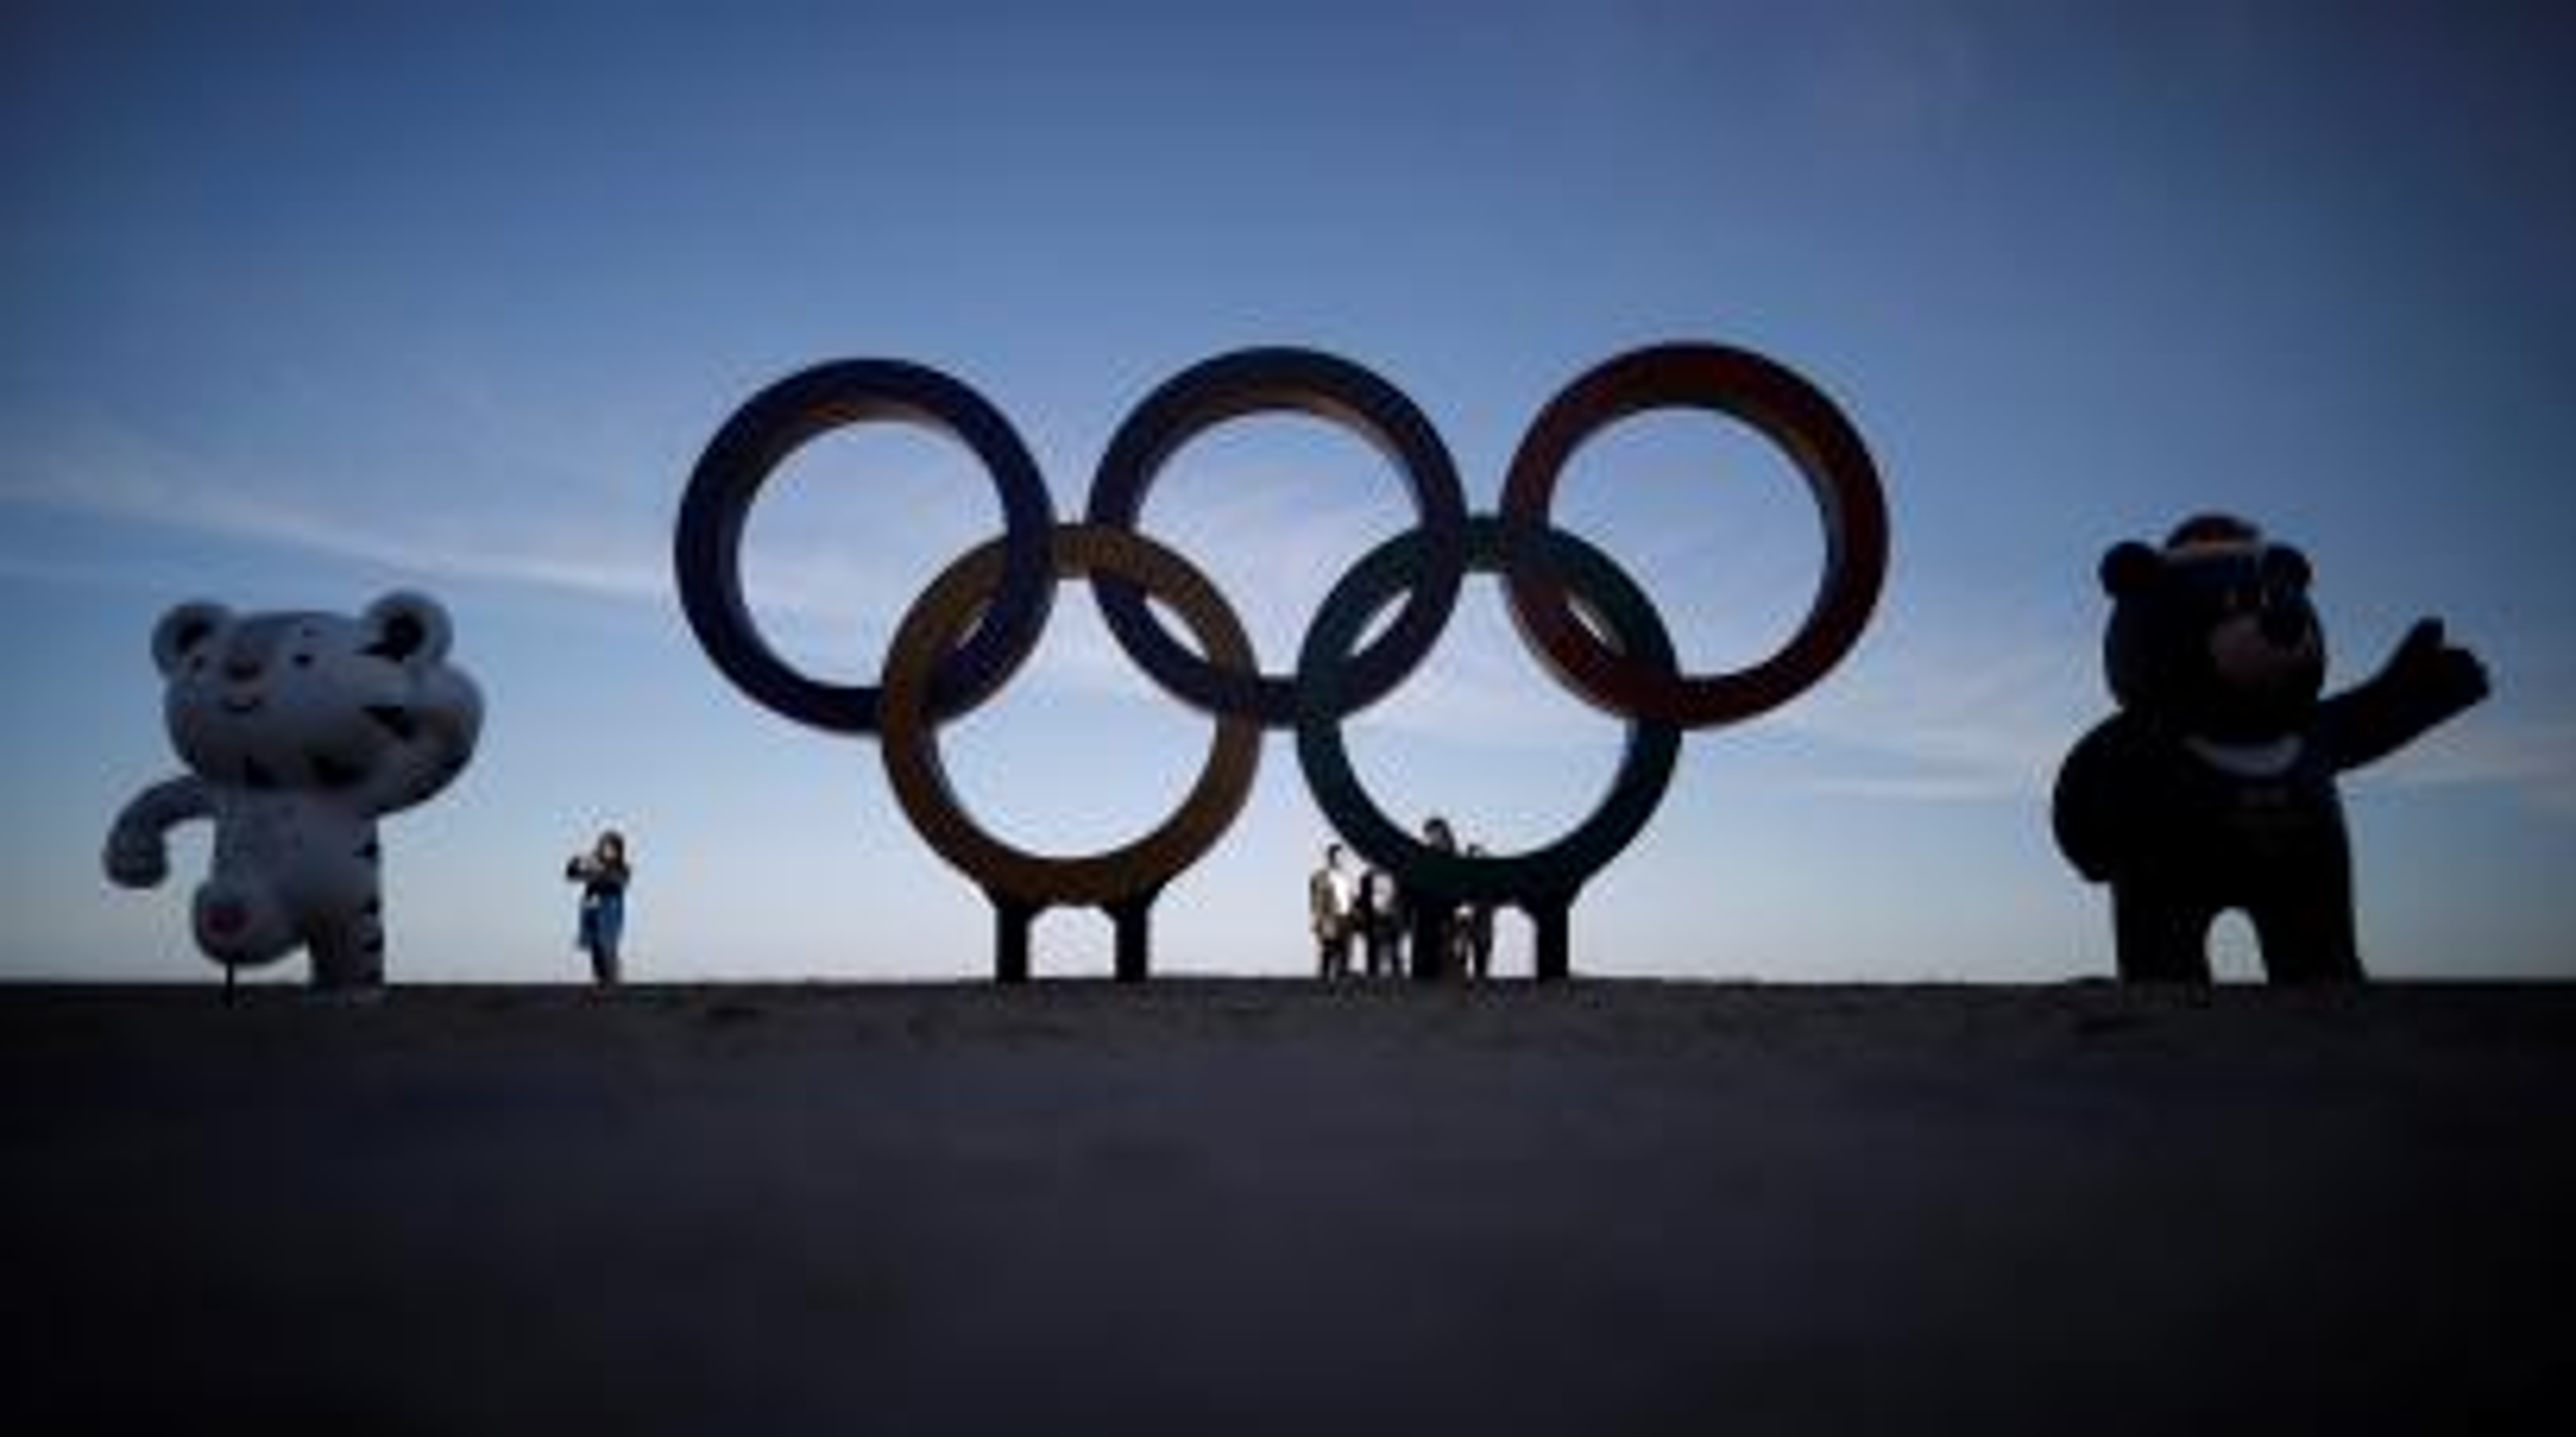 The 2018 PyeongChang Winter Olympics mascot Soohorang, Paralympics mascot Bandabi and the Olympic Rings are displayed at the Gyeongpodae beach in Gangneung